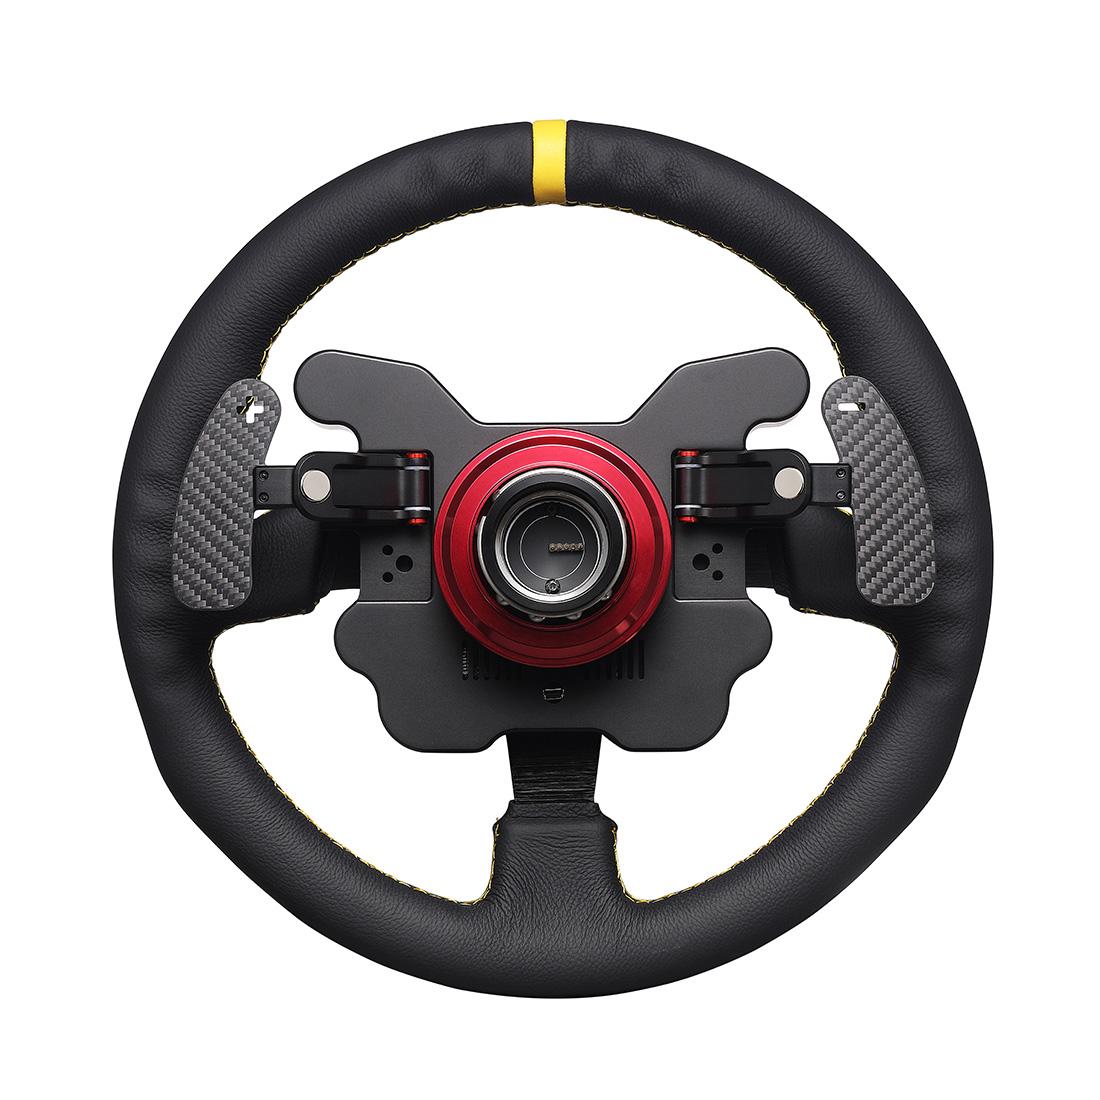 SIMAGIC Direct Drive Servo Alpha Base Racing Gaming Steering Wheel Simulator for Horizon 4 / Euro Truck / DIRT / GTS / PS4 (Single Shift Paddle Steering Wheel + Alpha Servo Base)